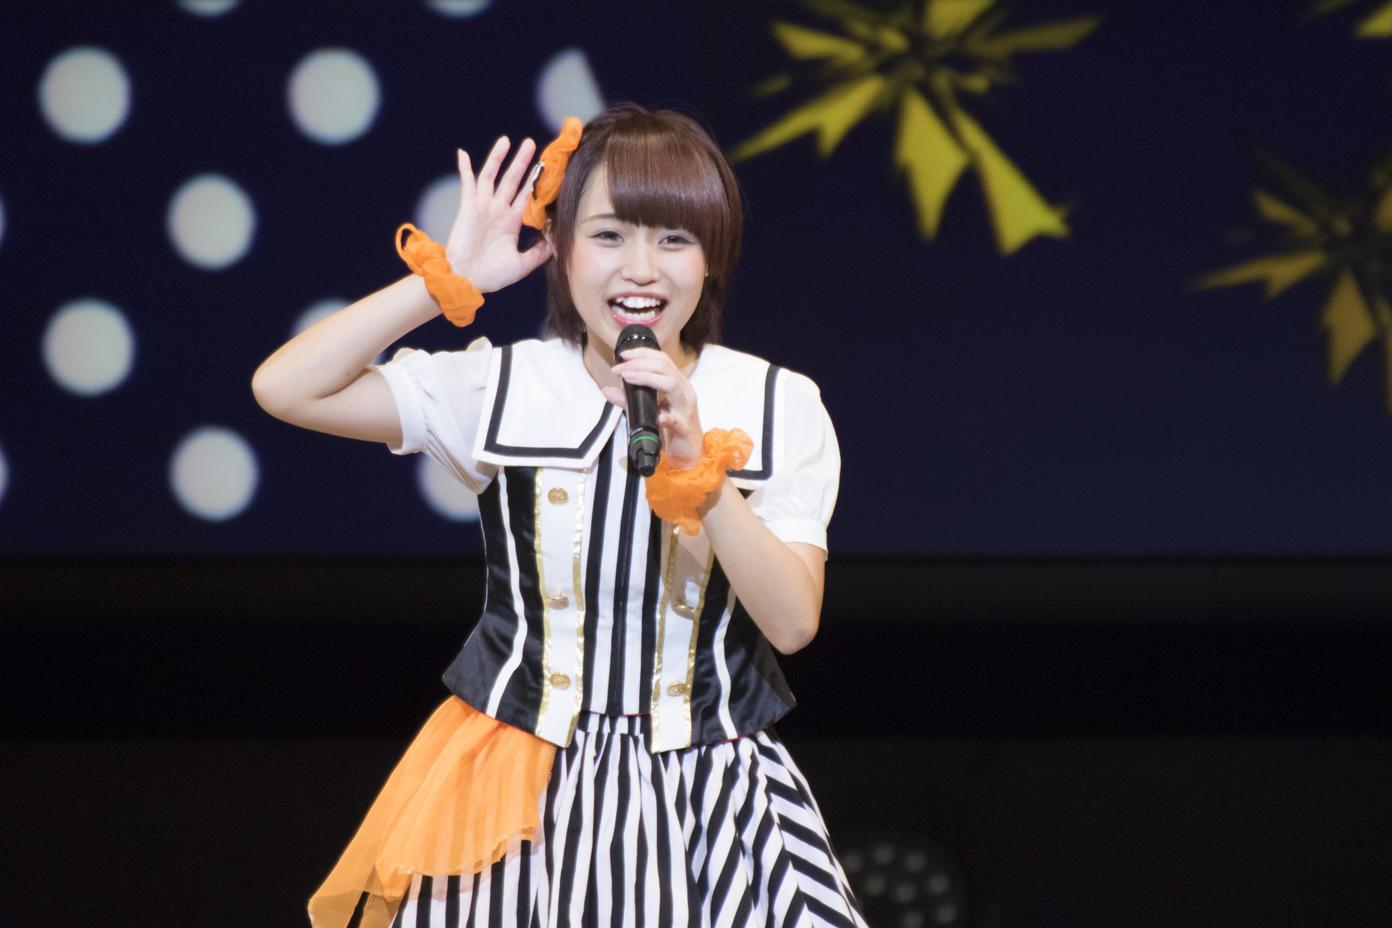 http://news.yoshimoto.co.jp/20161228153337-a68e56e61e6e8b015ae8a6841ca34f292f3ea175.jpg